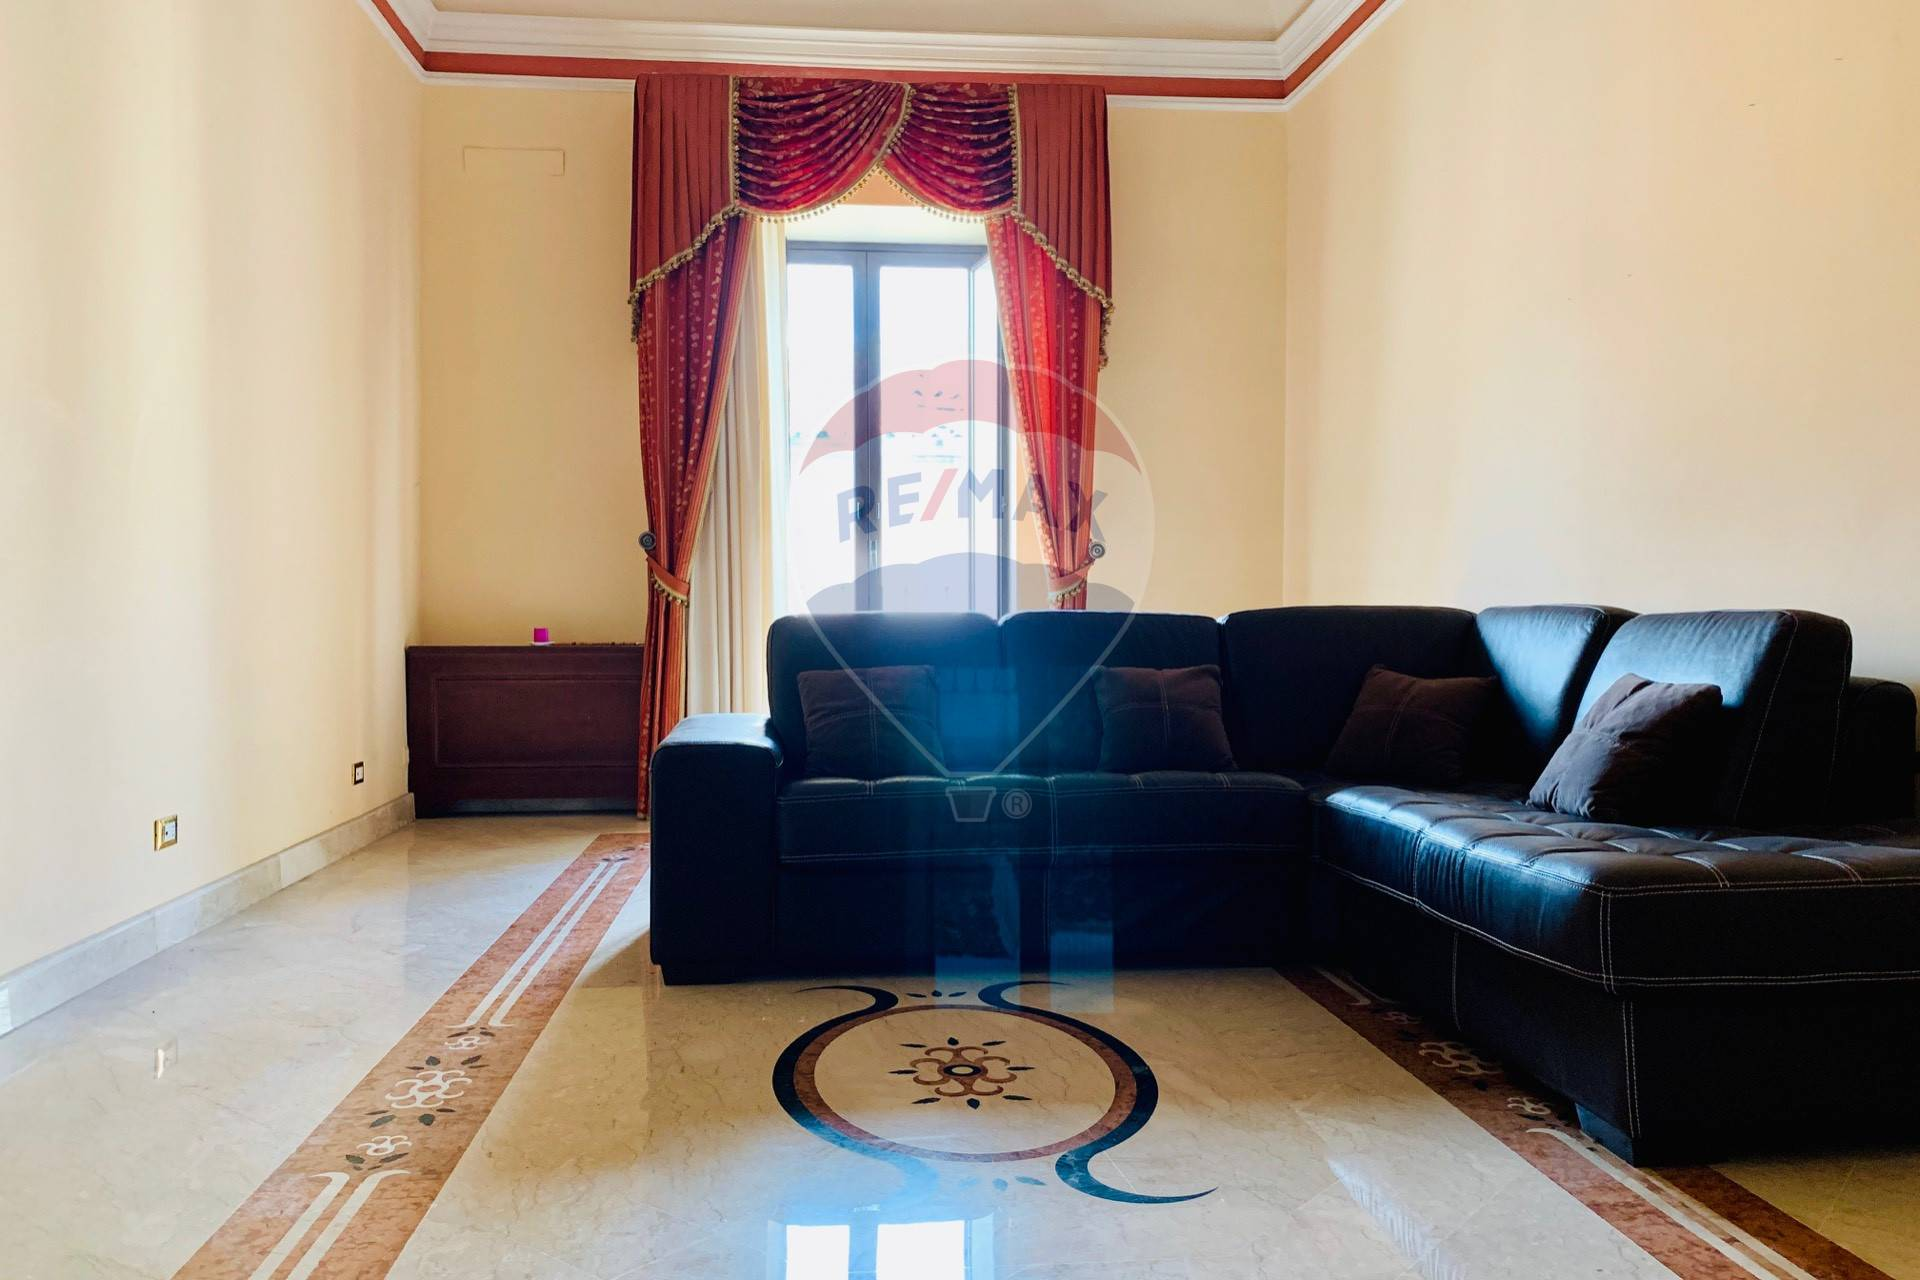 catania affitto quart: catania-centro storico,garibaldi,vittorio emanuele re-max-reliance-2